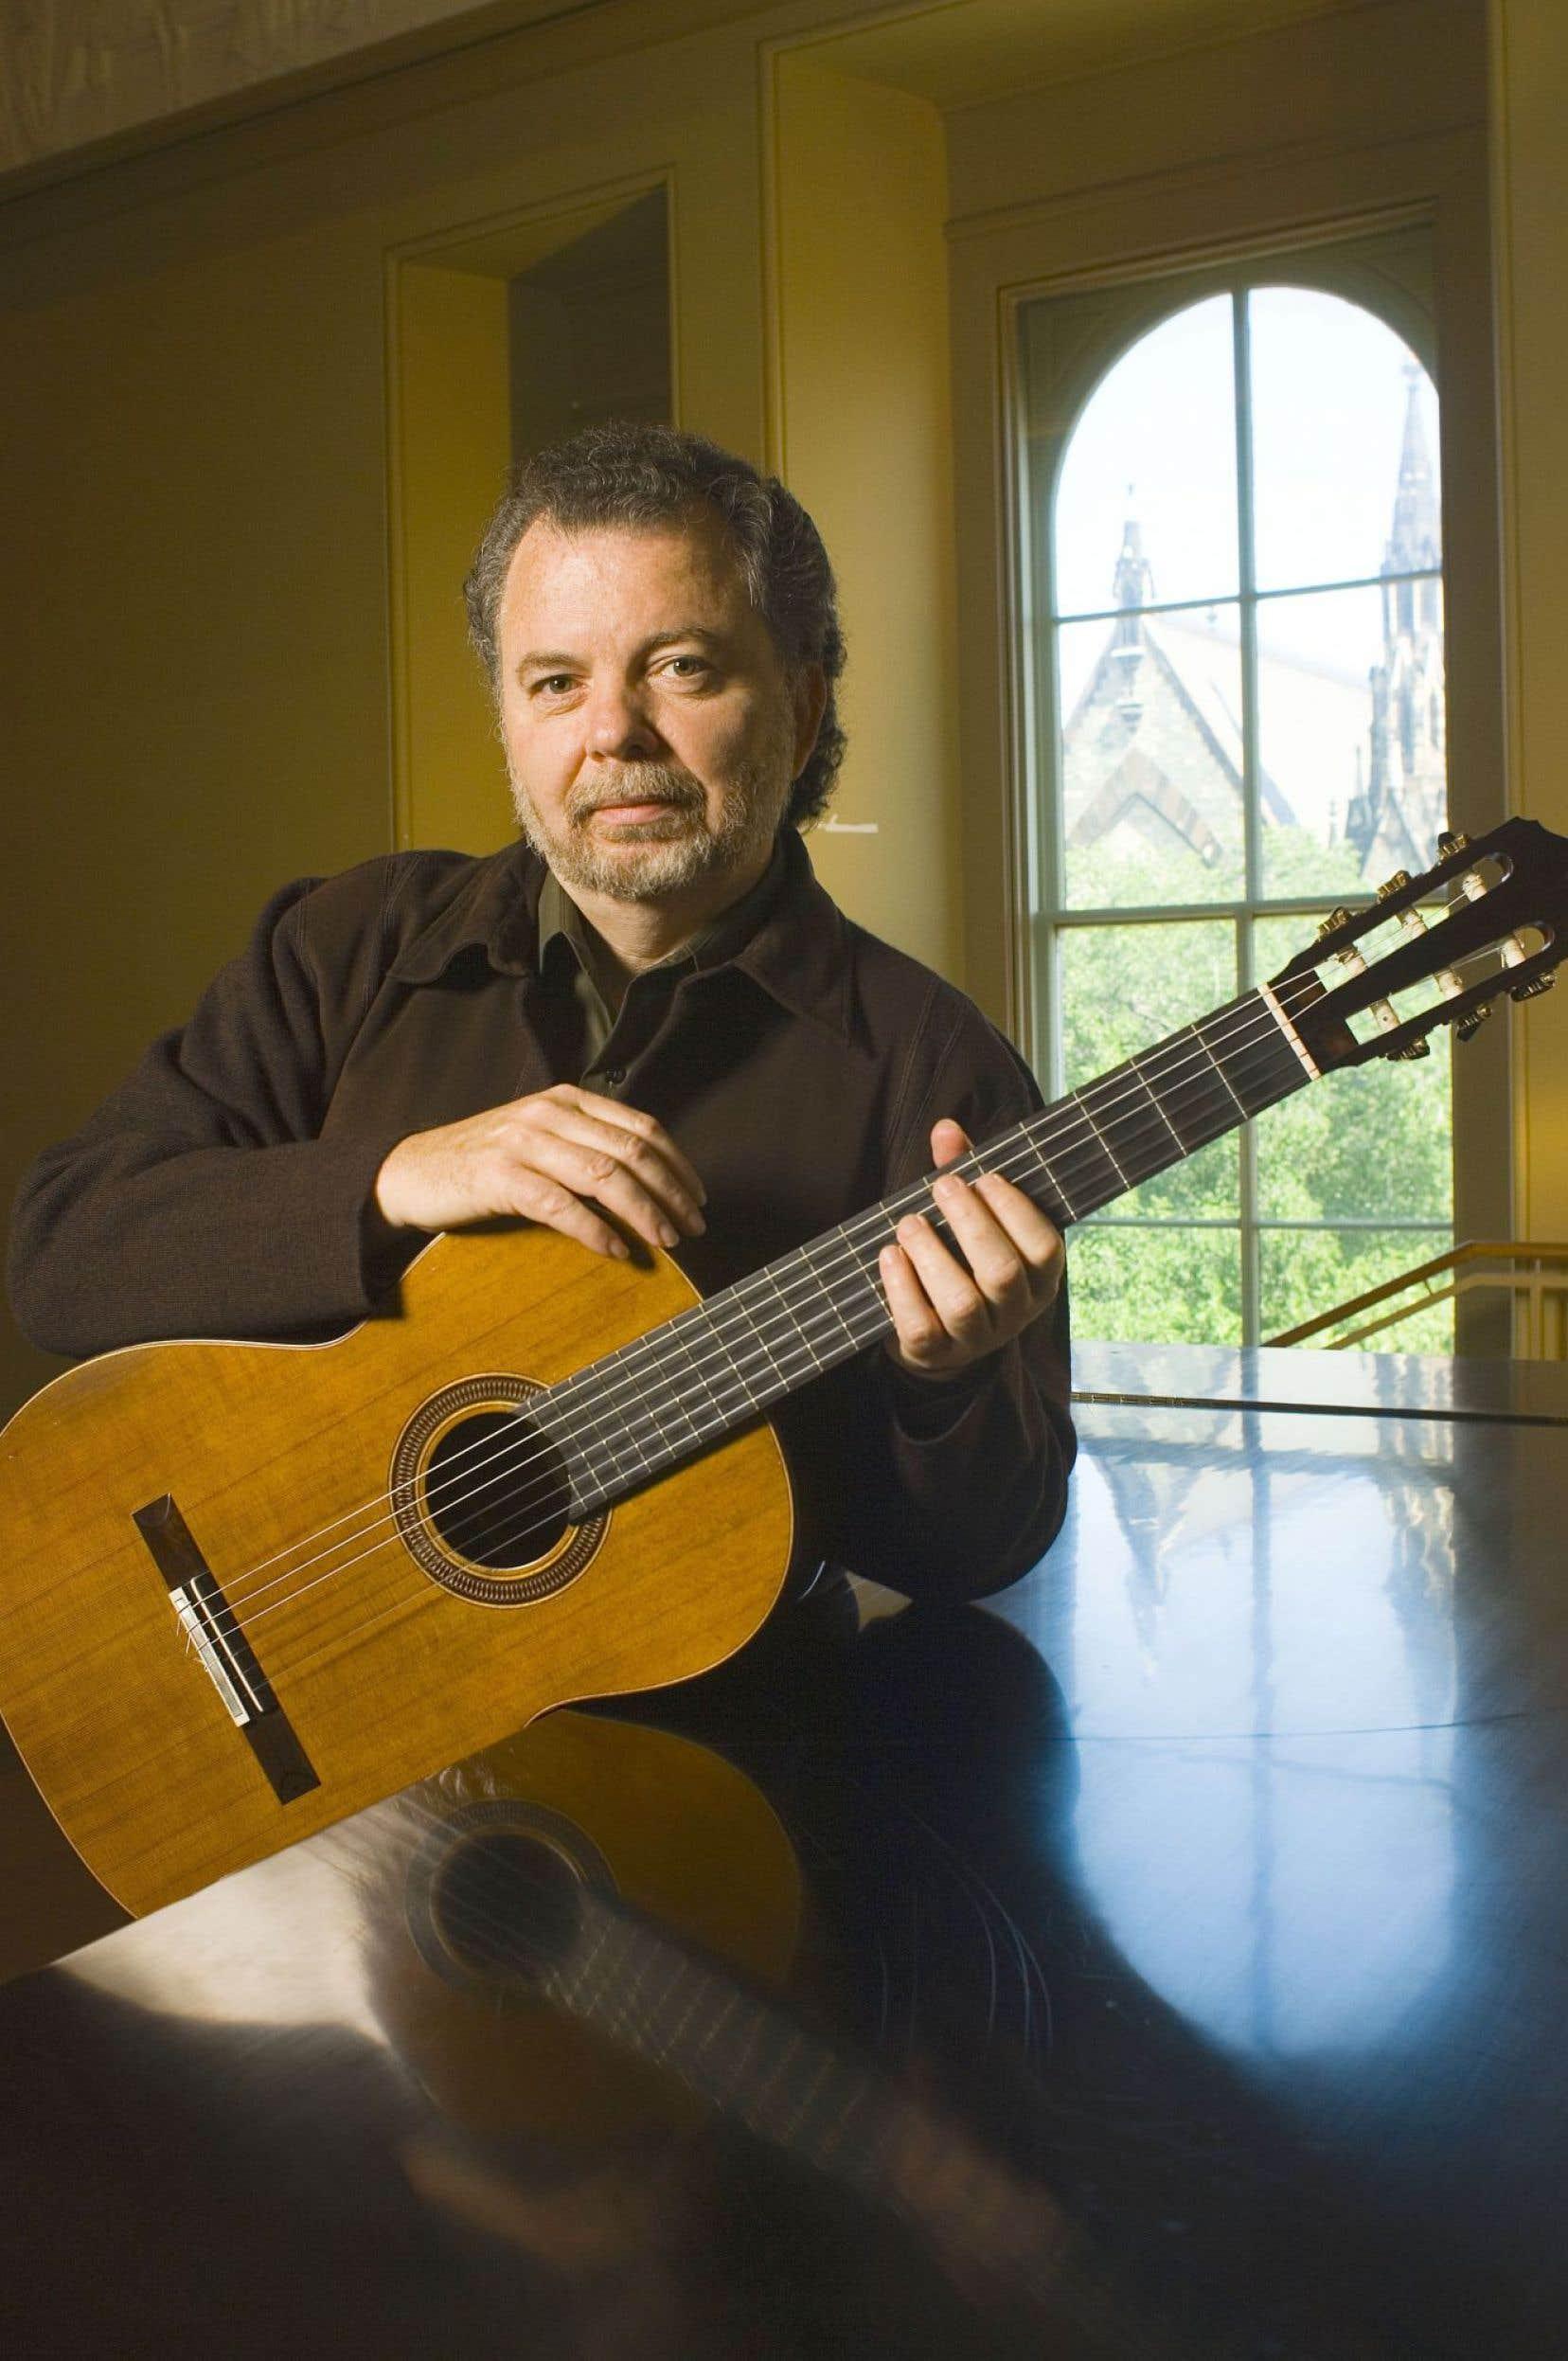 Le guitariste Manuel Barrueco